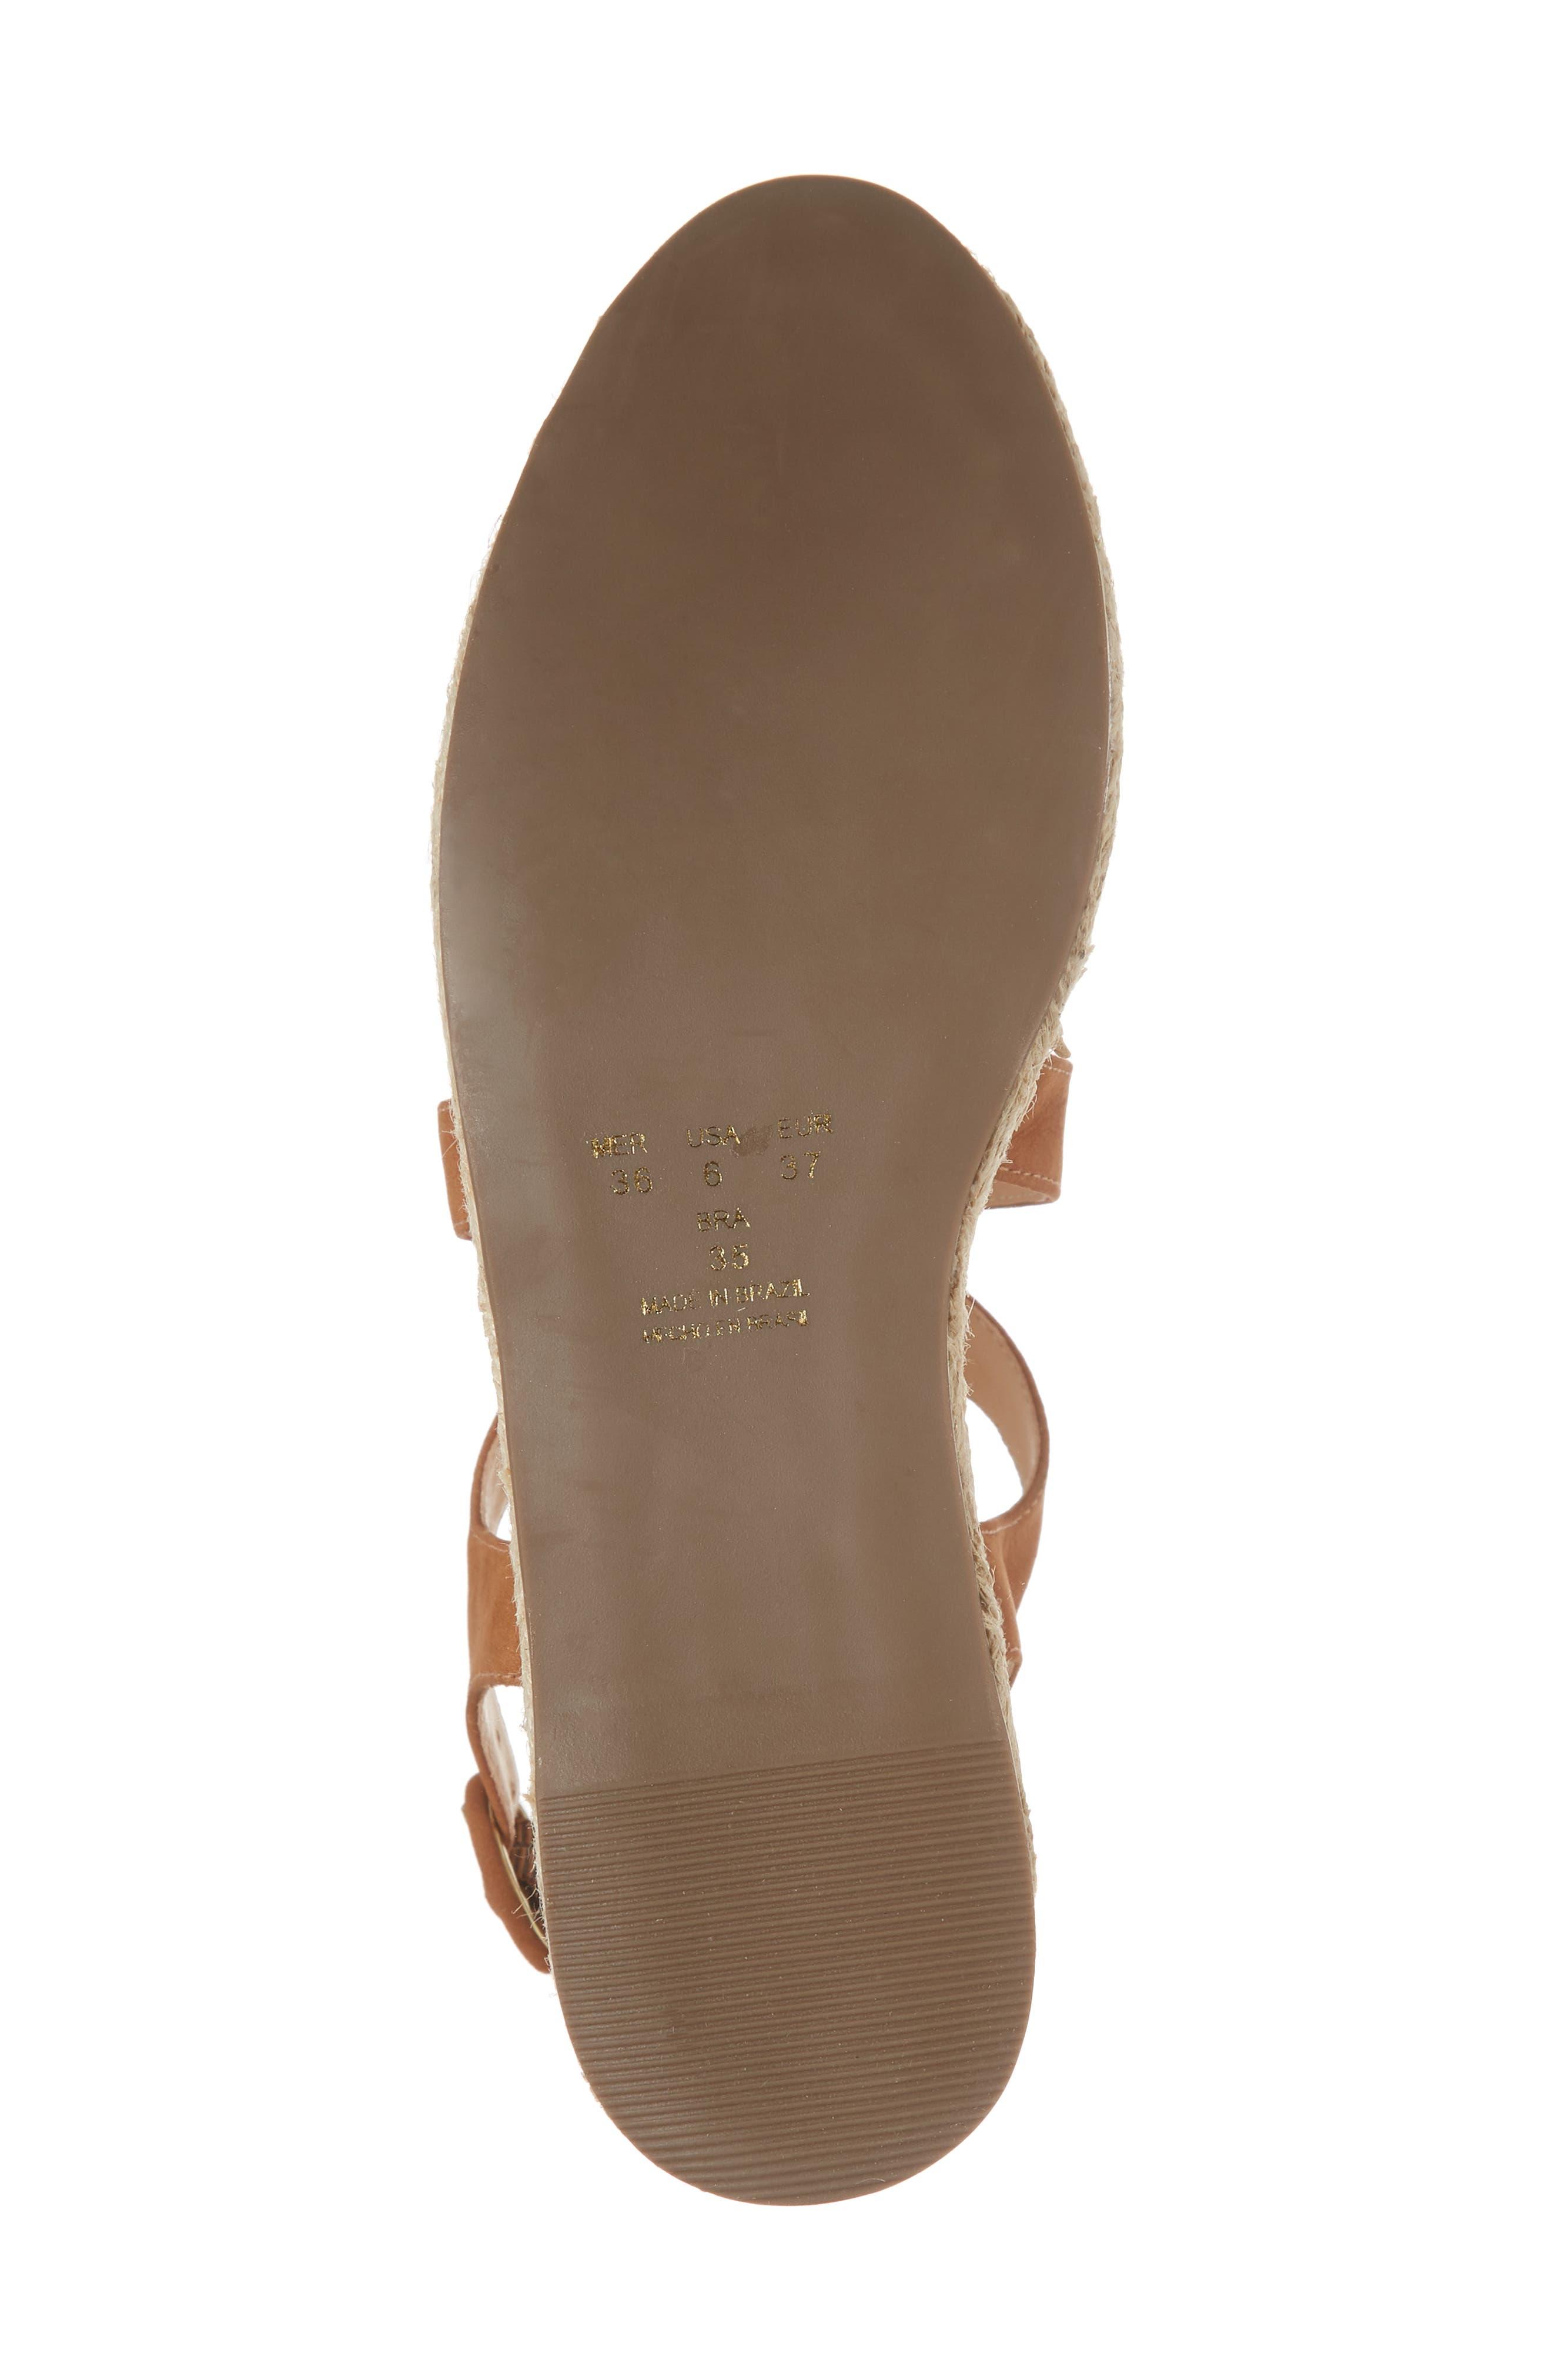 Vikki Espadrille Platform Sandal,                             Alternate thumbnail 6, color,                             Tan Leather